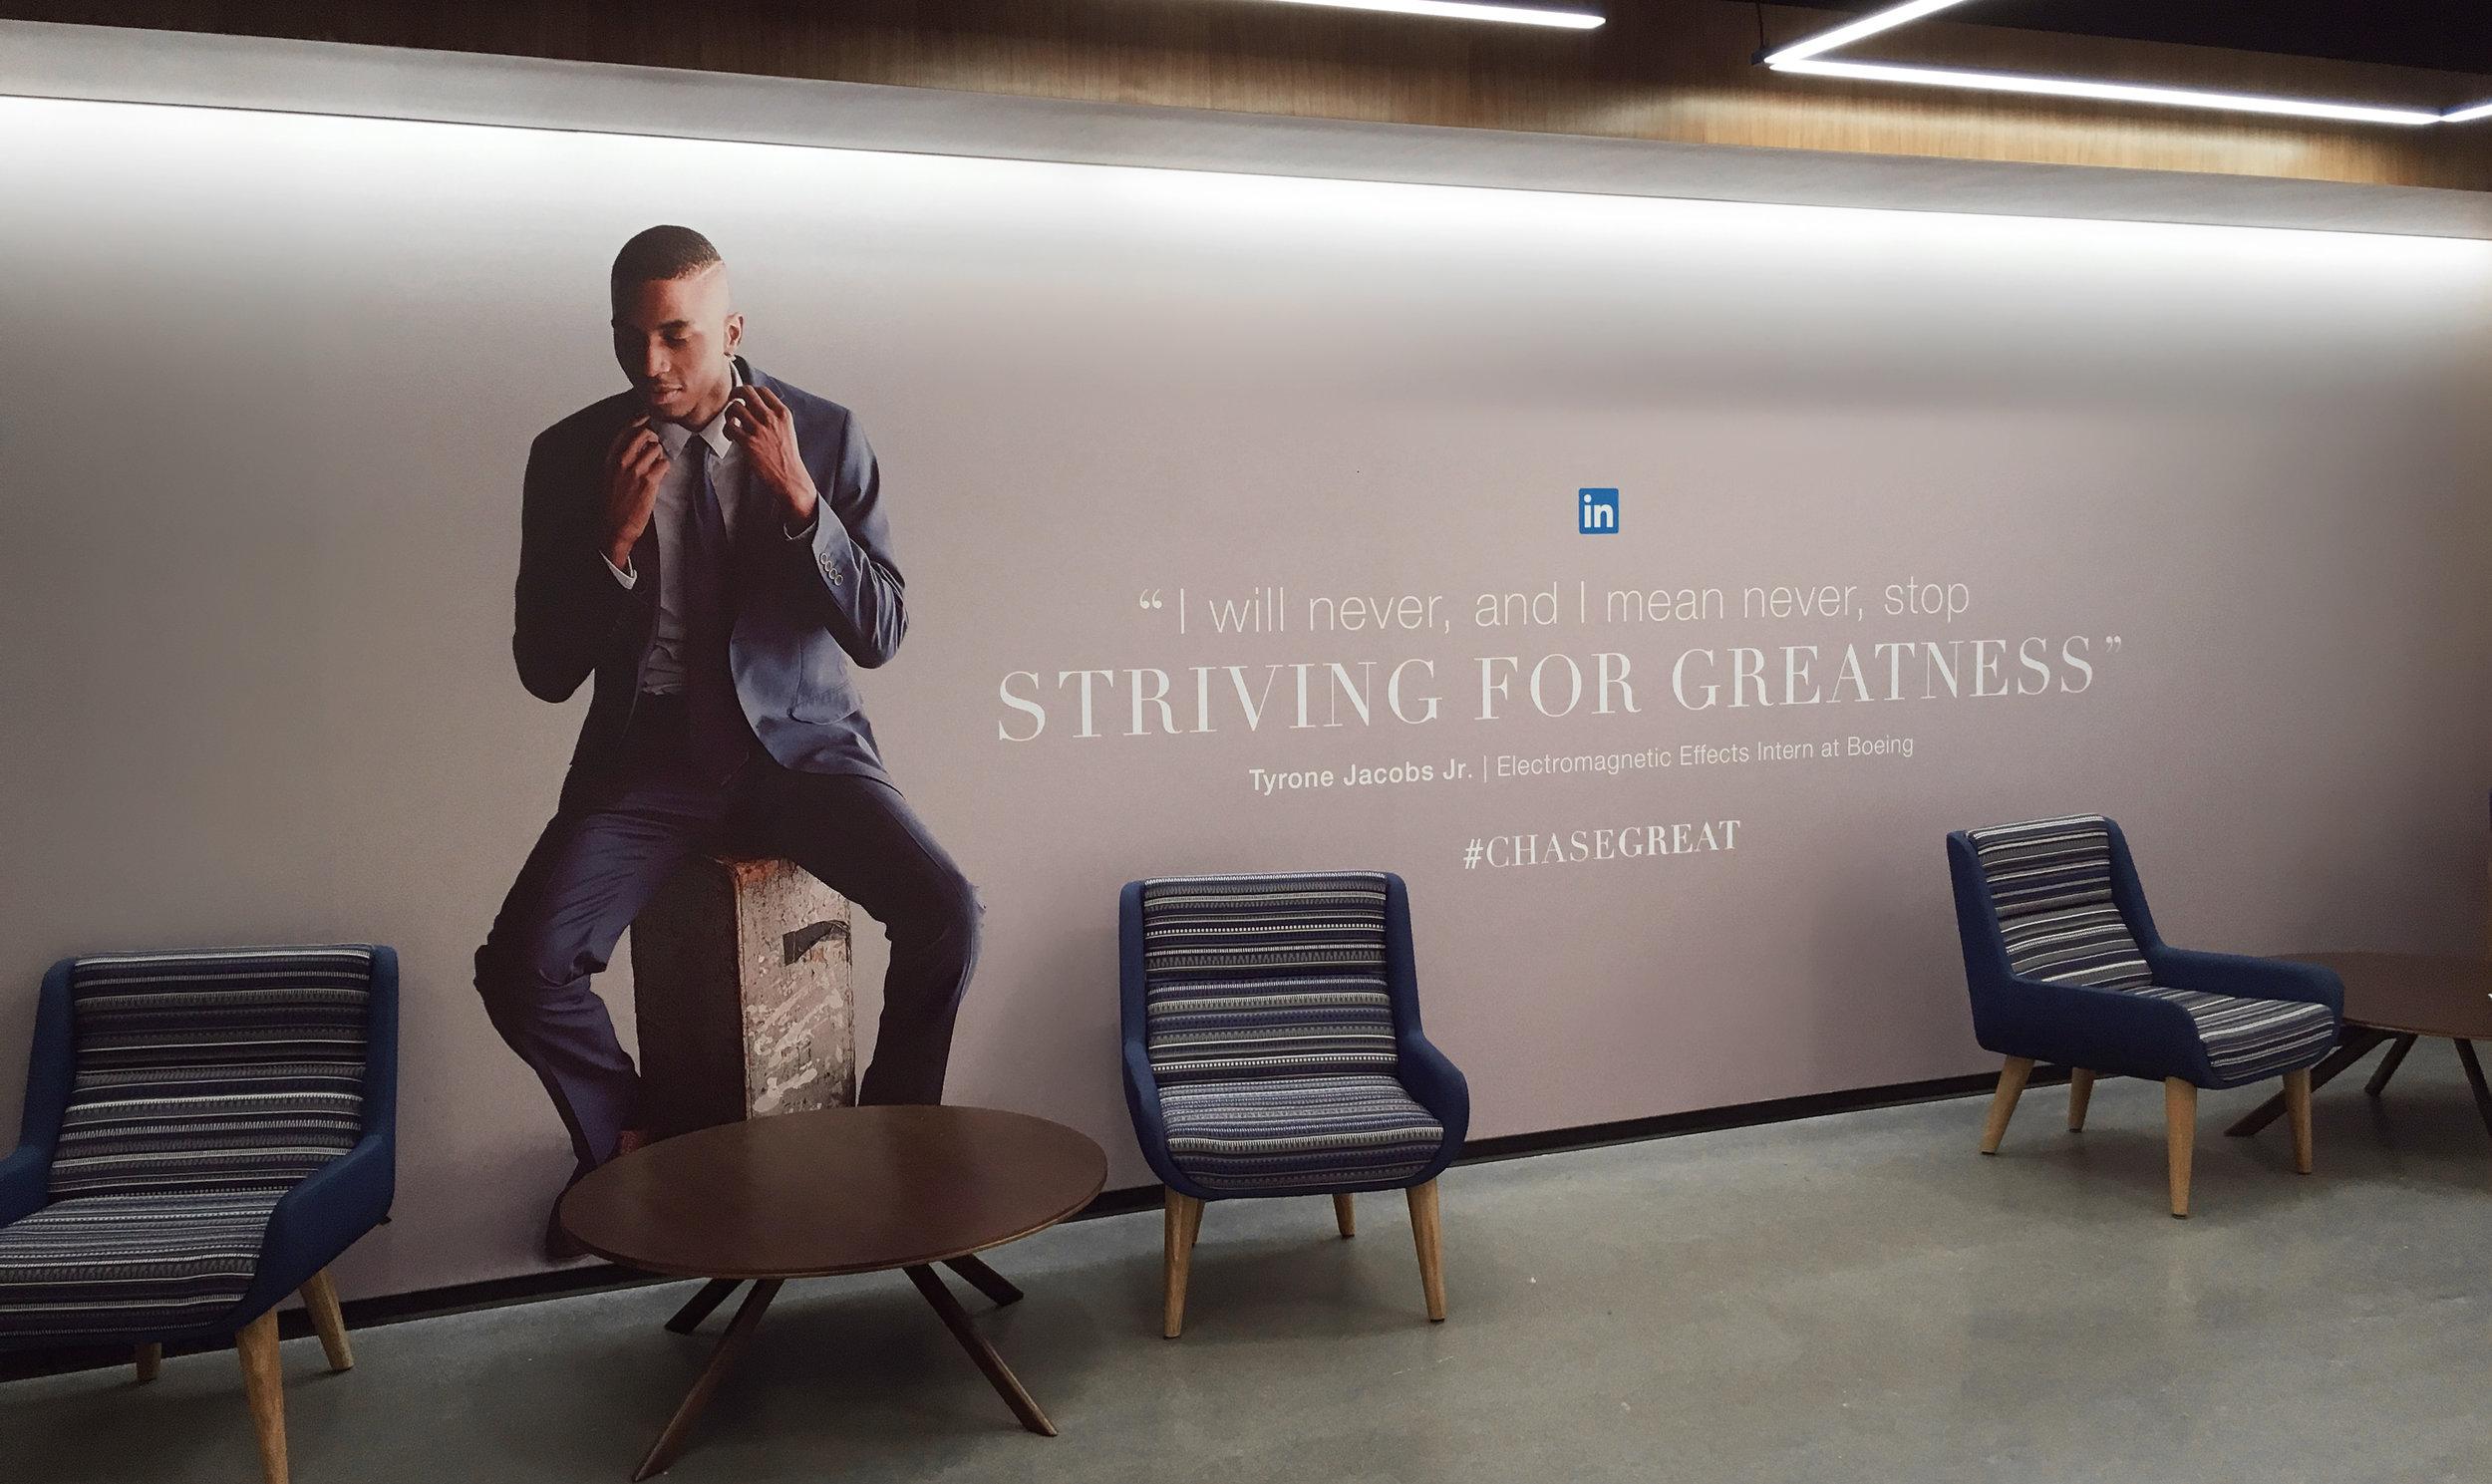 Campaign mural in LinkedIn's San Francisco office